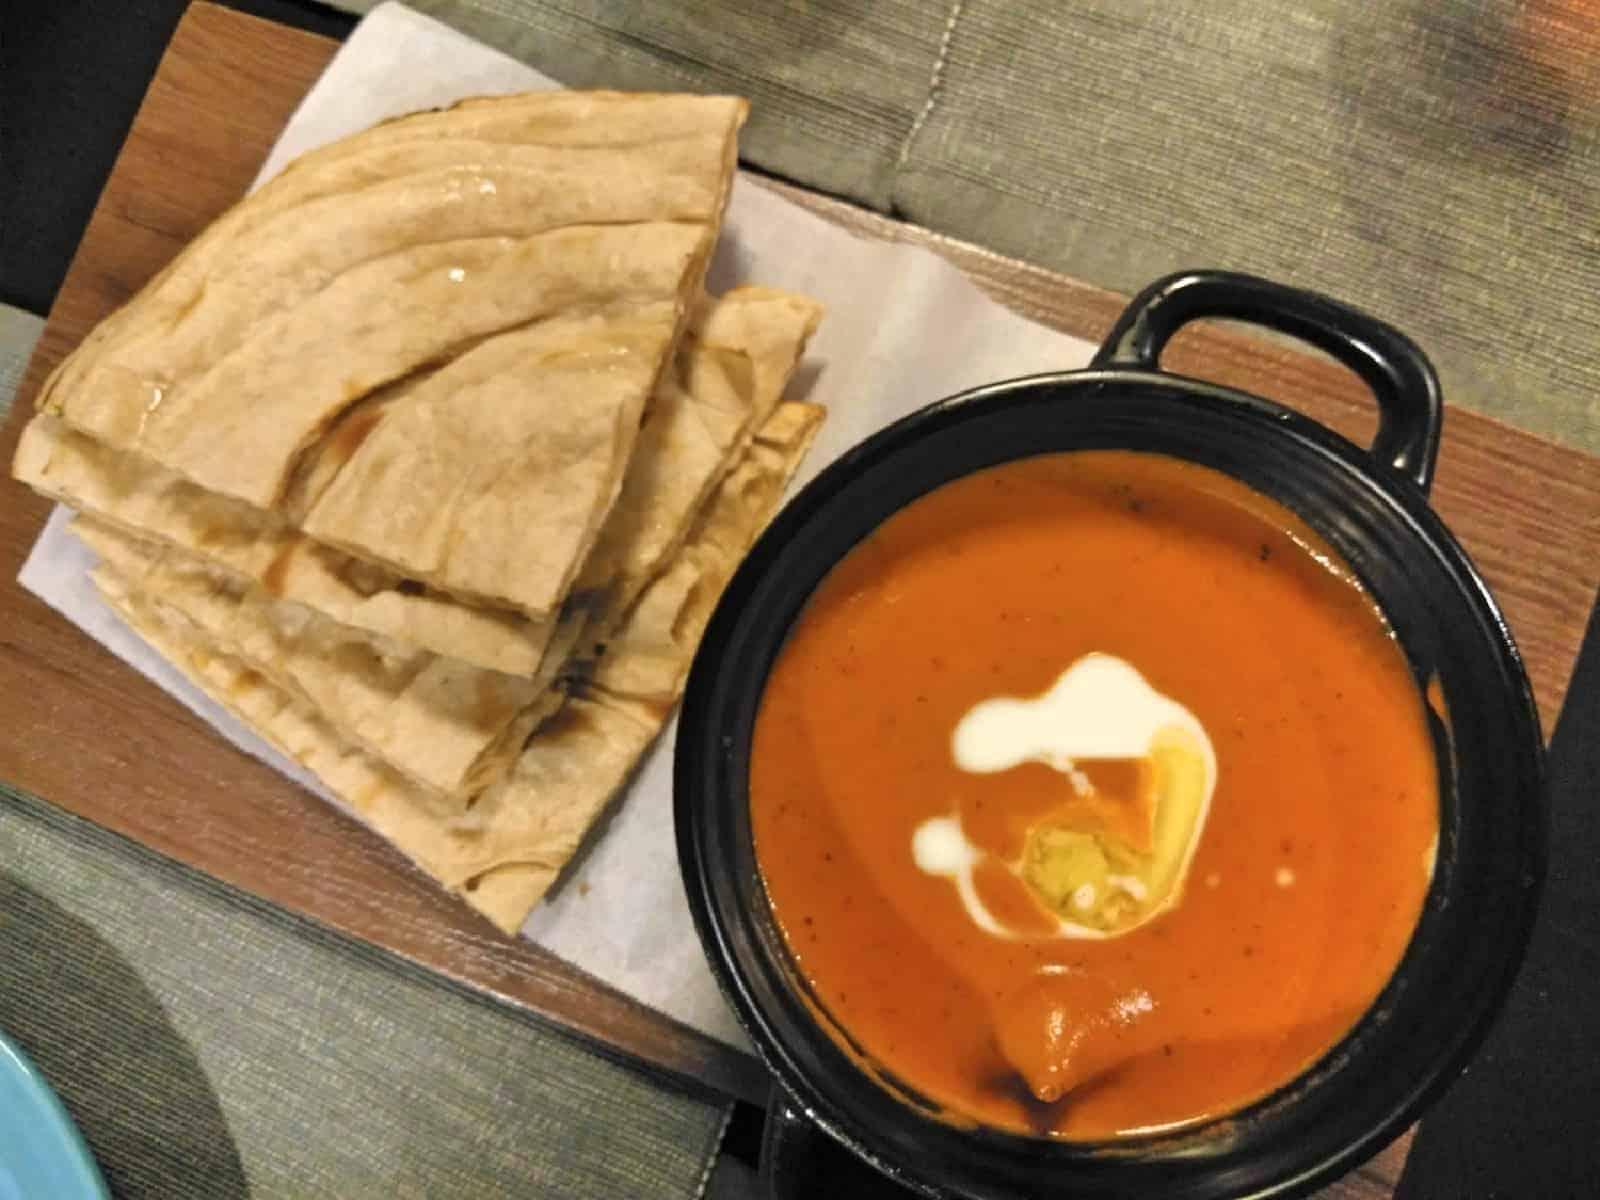 Flour-Bukit-Damansara-North-Indian-restaurant-Kuala-Lumpur-Malaysia-Travel-Mermaid-02